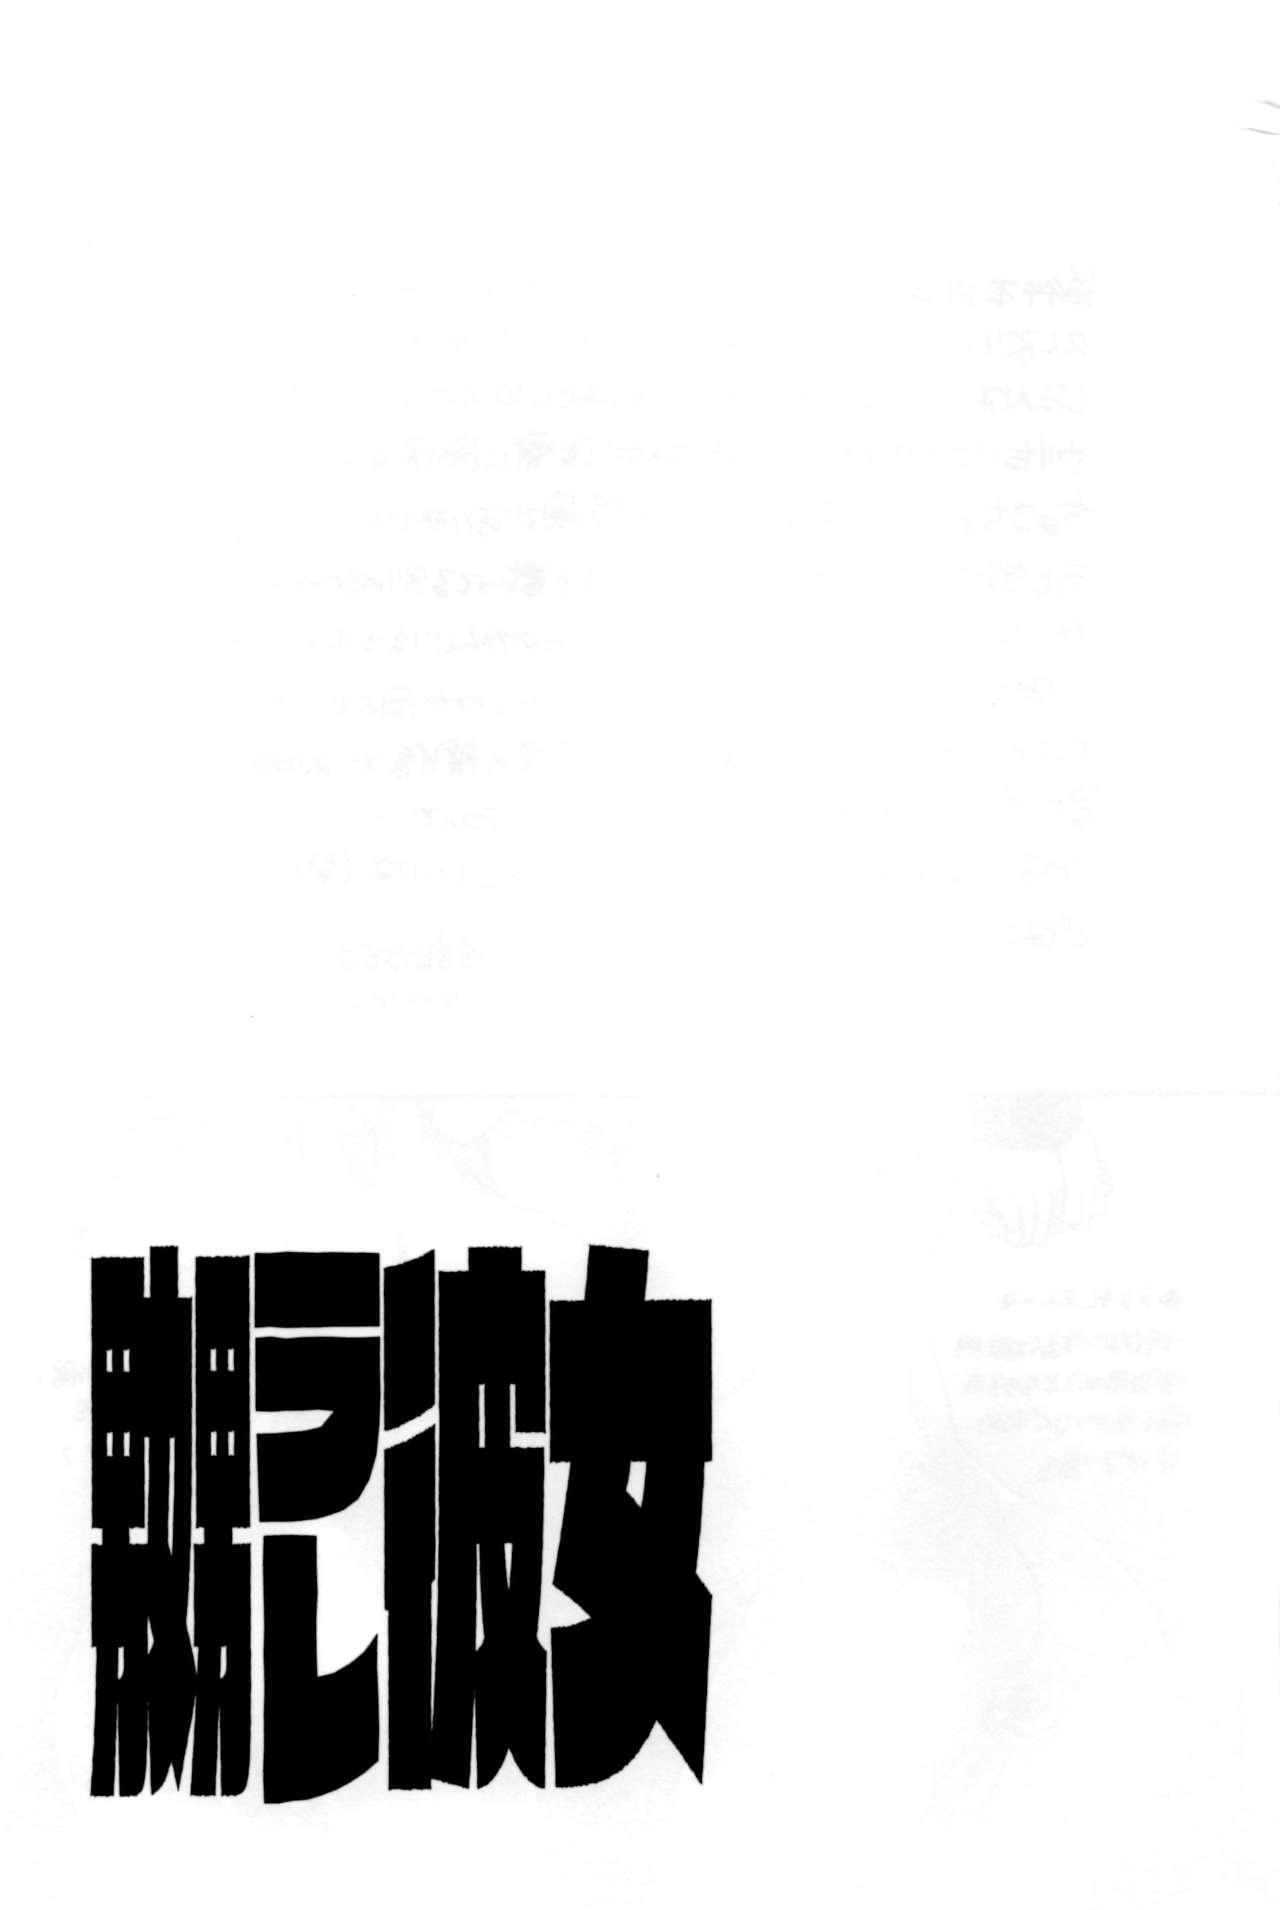 Naburare Kanojo 179